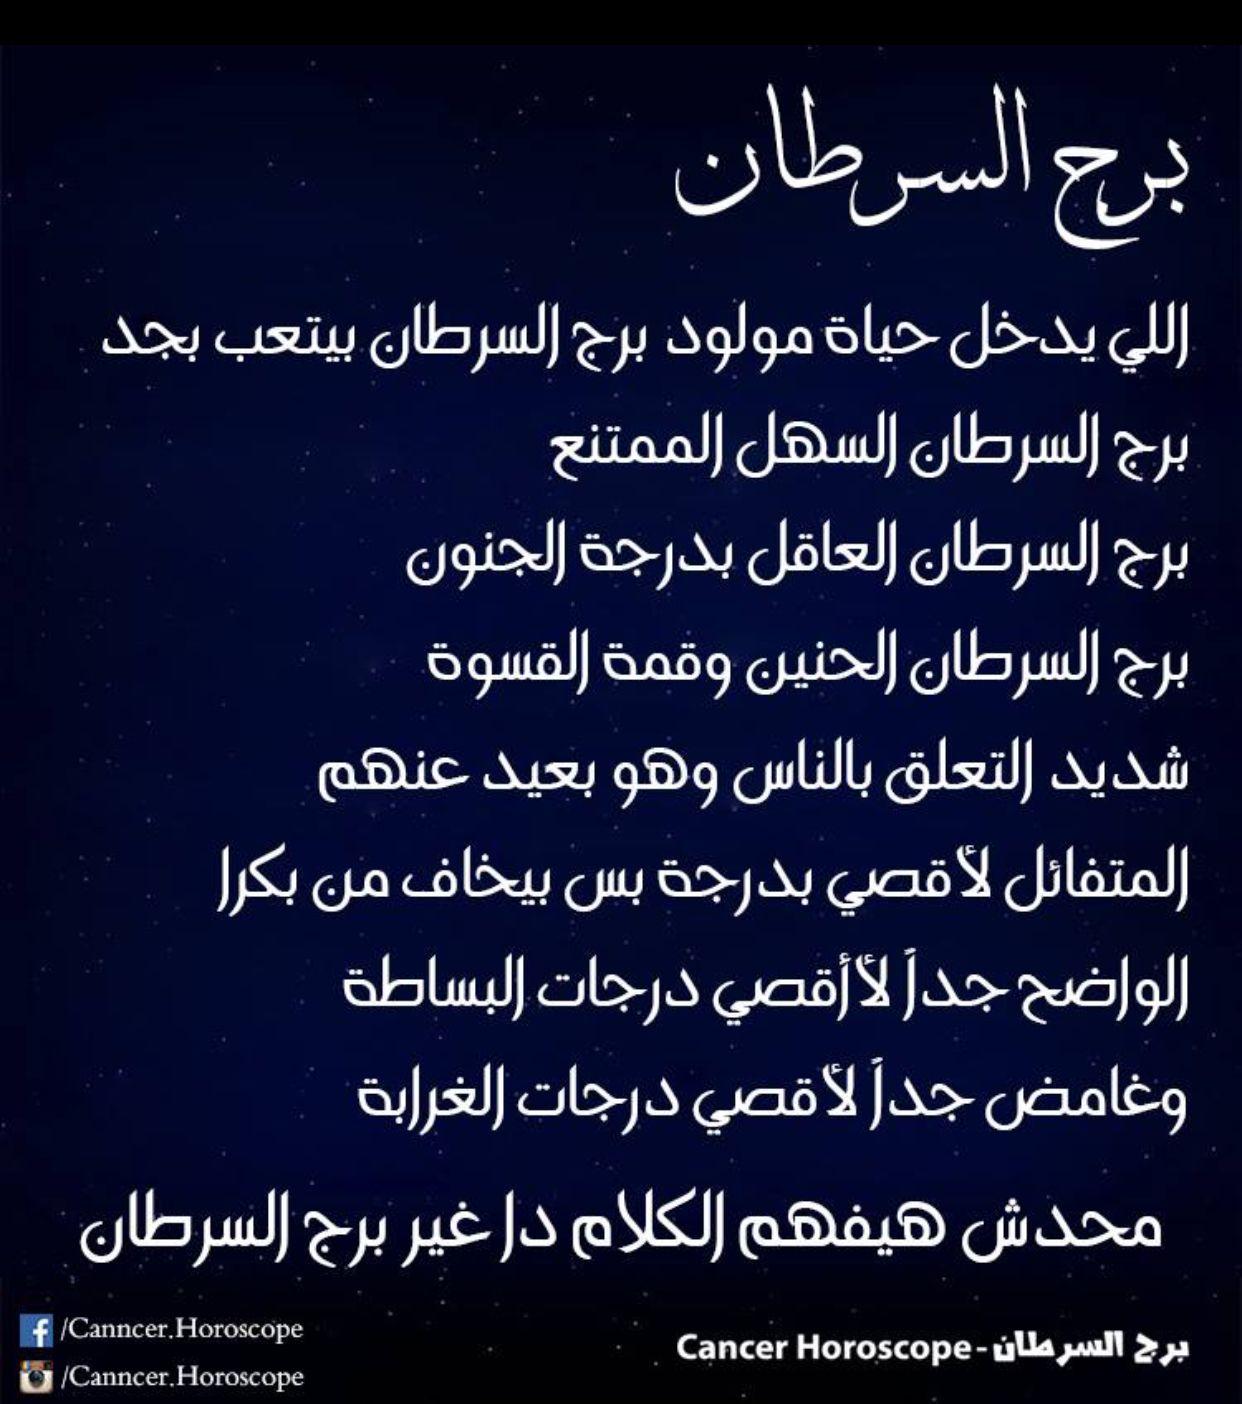 Pin By Wahab Ninauwa On Cancer Horoscope Islamic Inspirational Quotes Cancer Horoscope Quotes